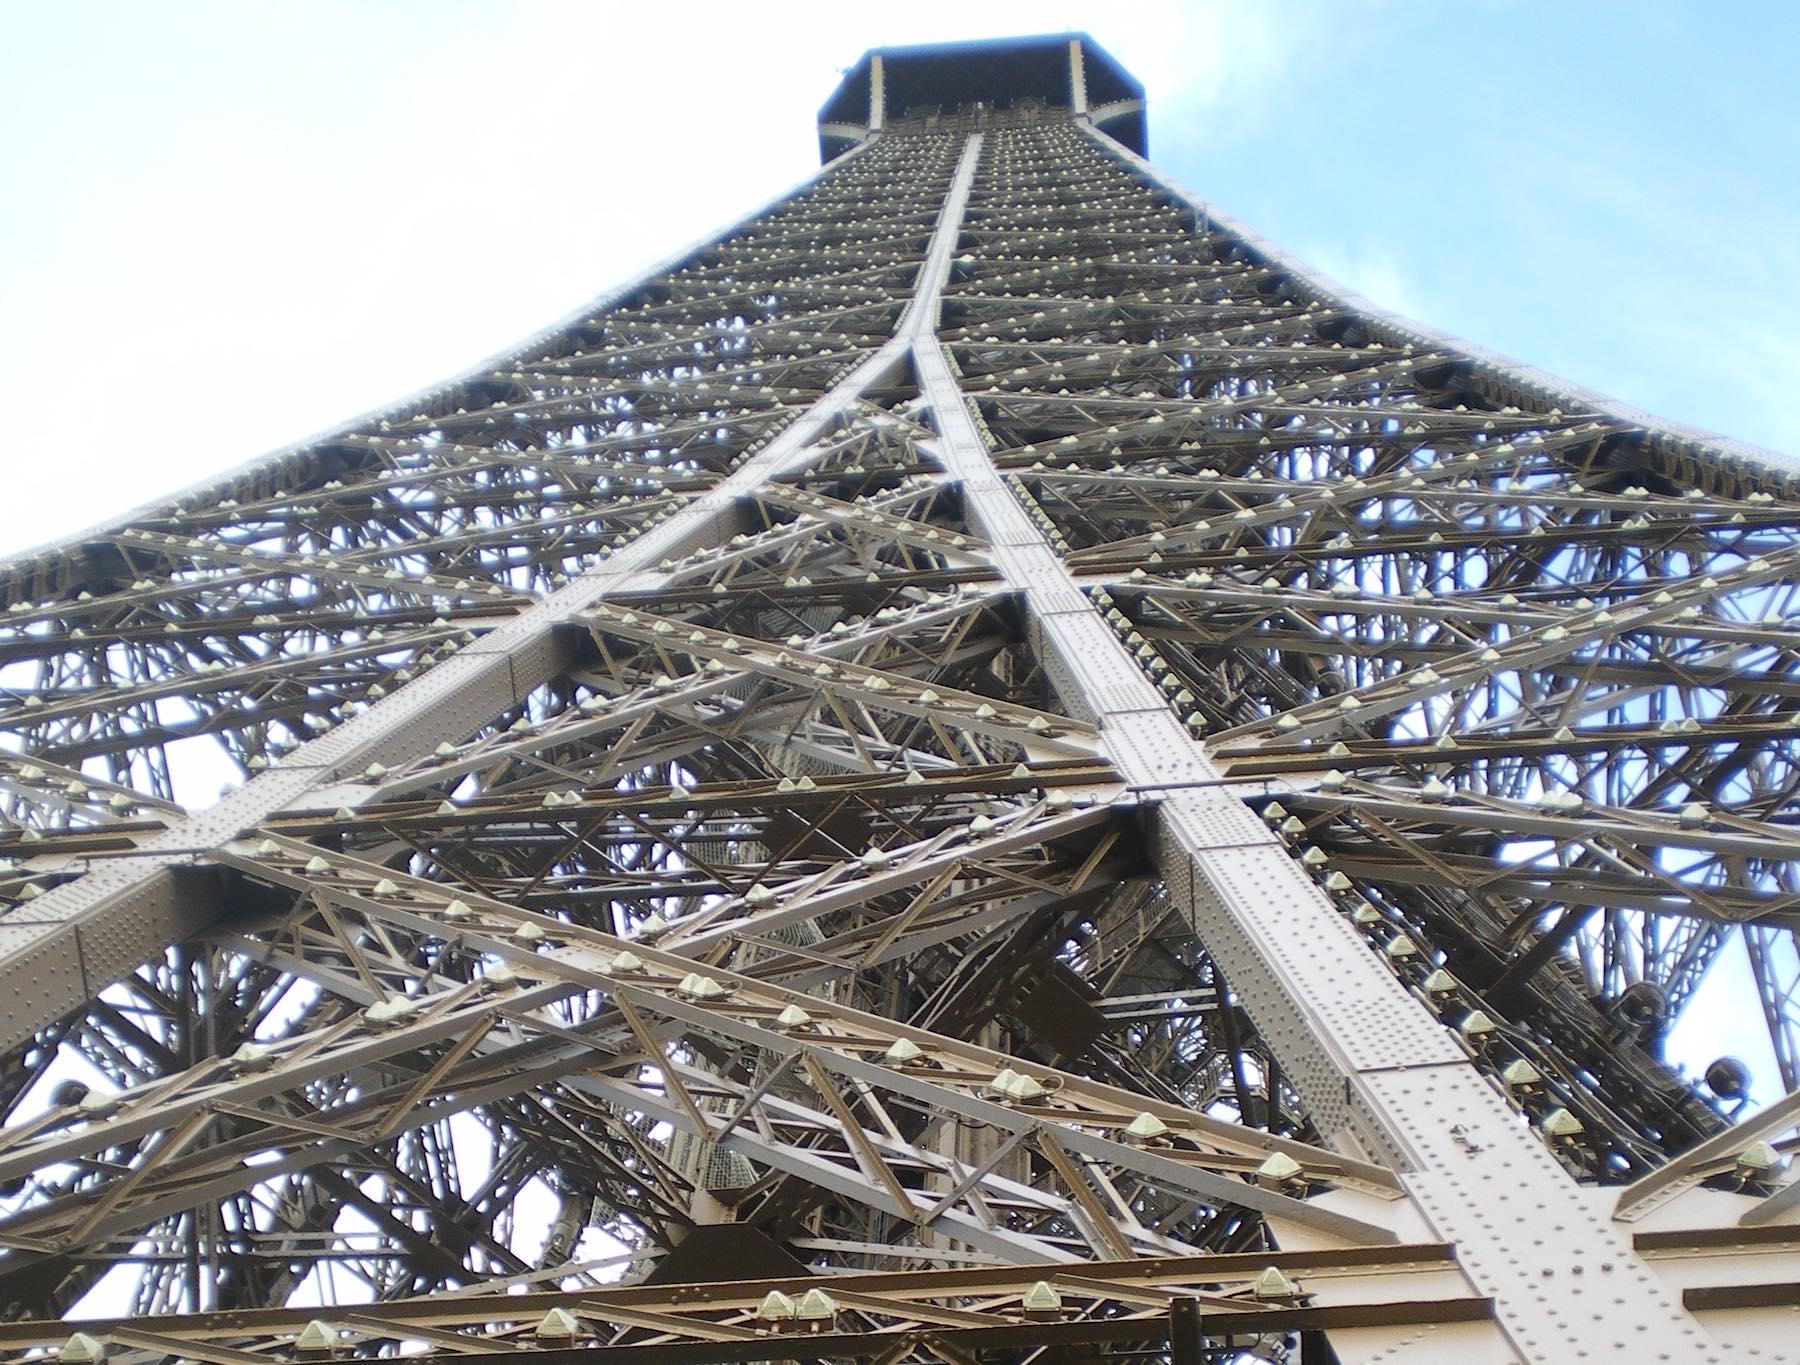 Upwards shot of the Eiffel Tower in Paris